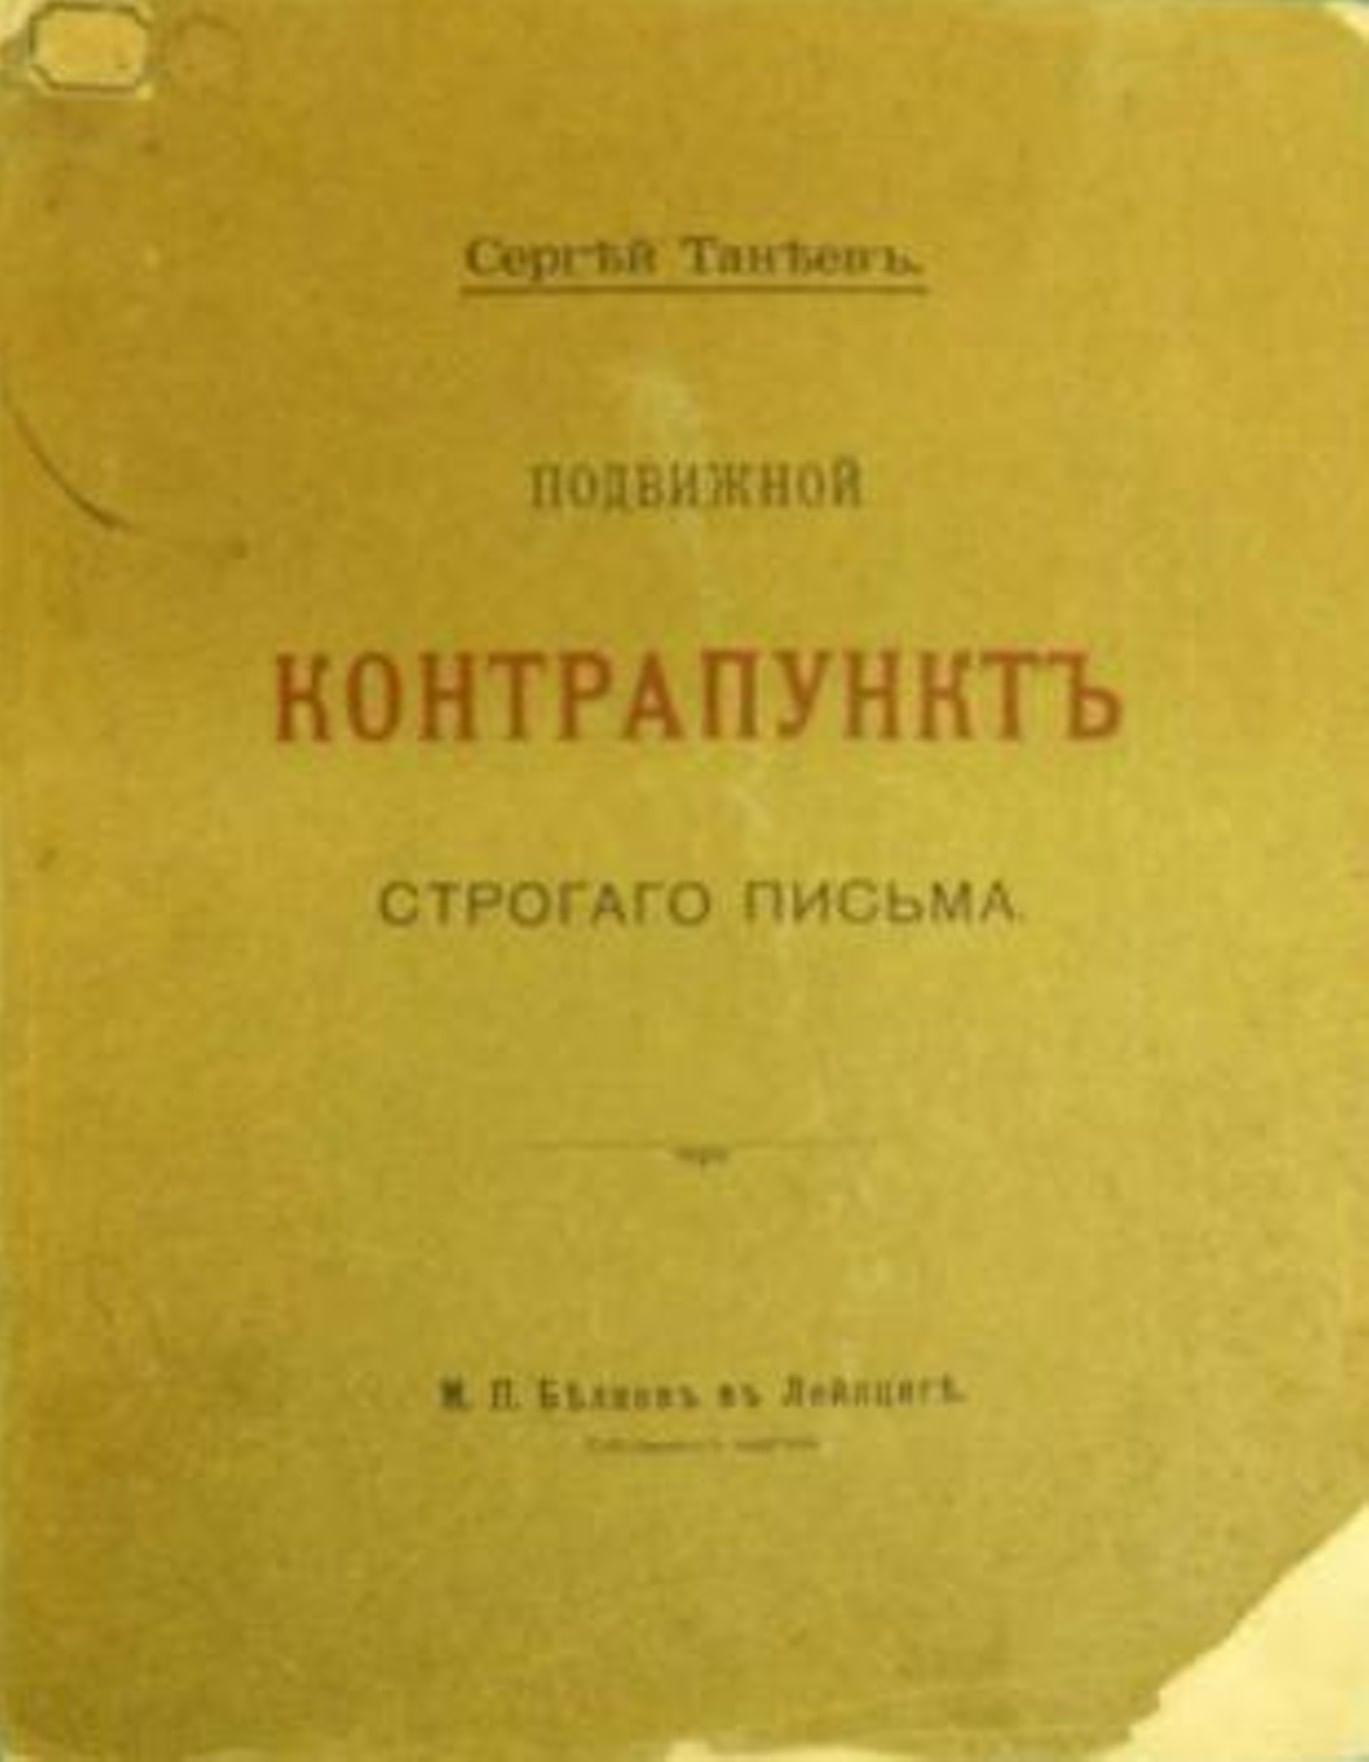 Сергей Танеев. Галерея 1